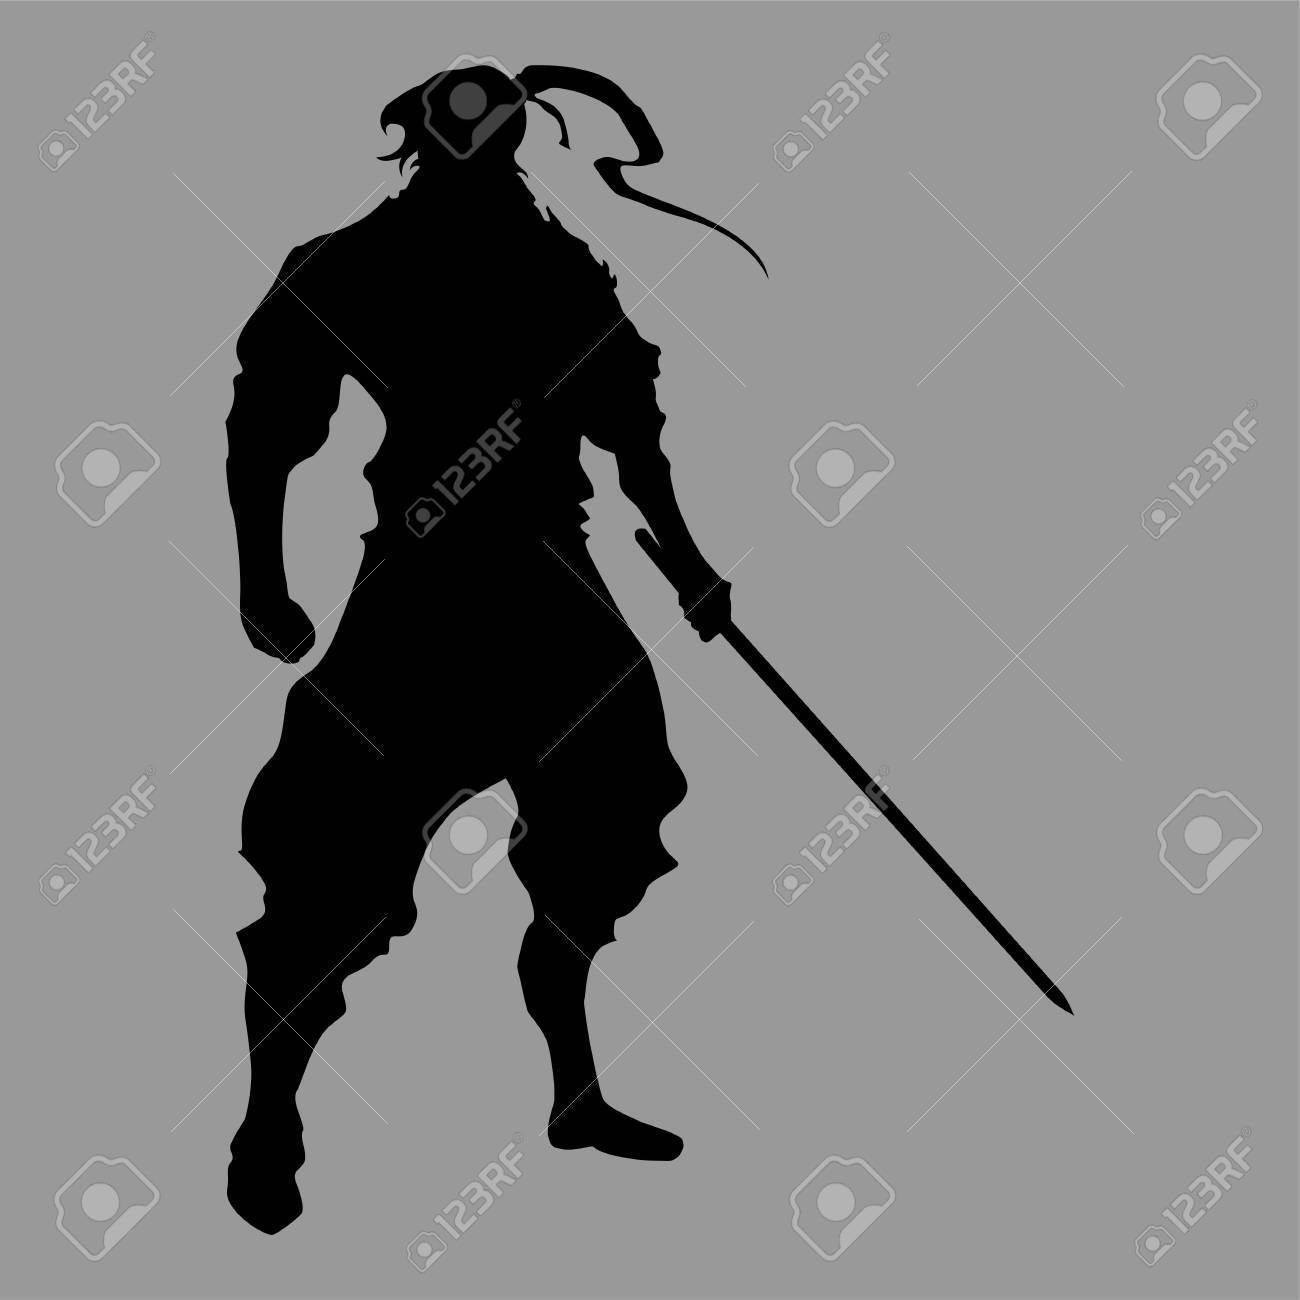 A Samurai Silhouette Warrior Sword Ninja Japanese Katana On A